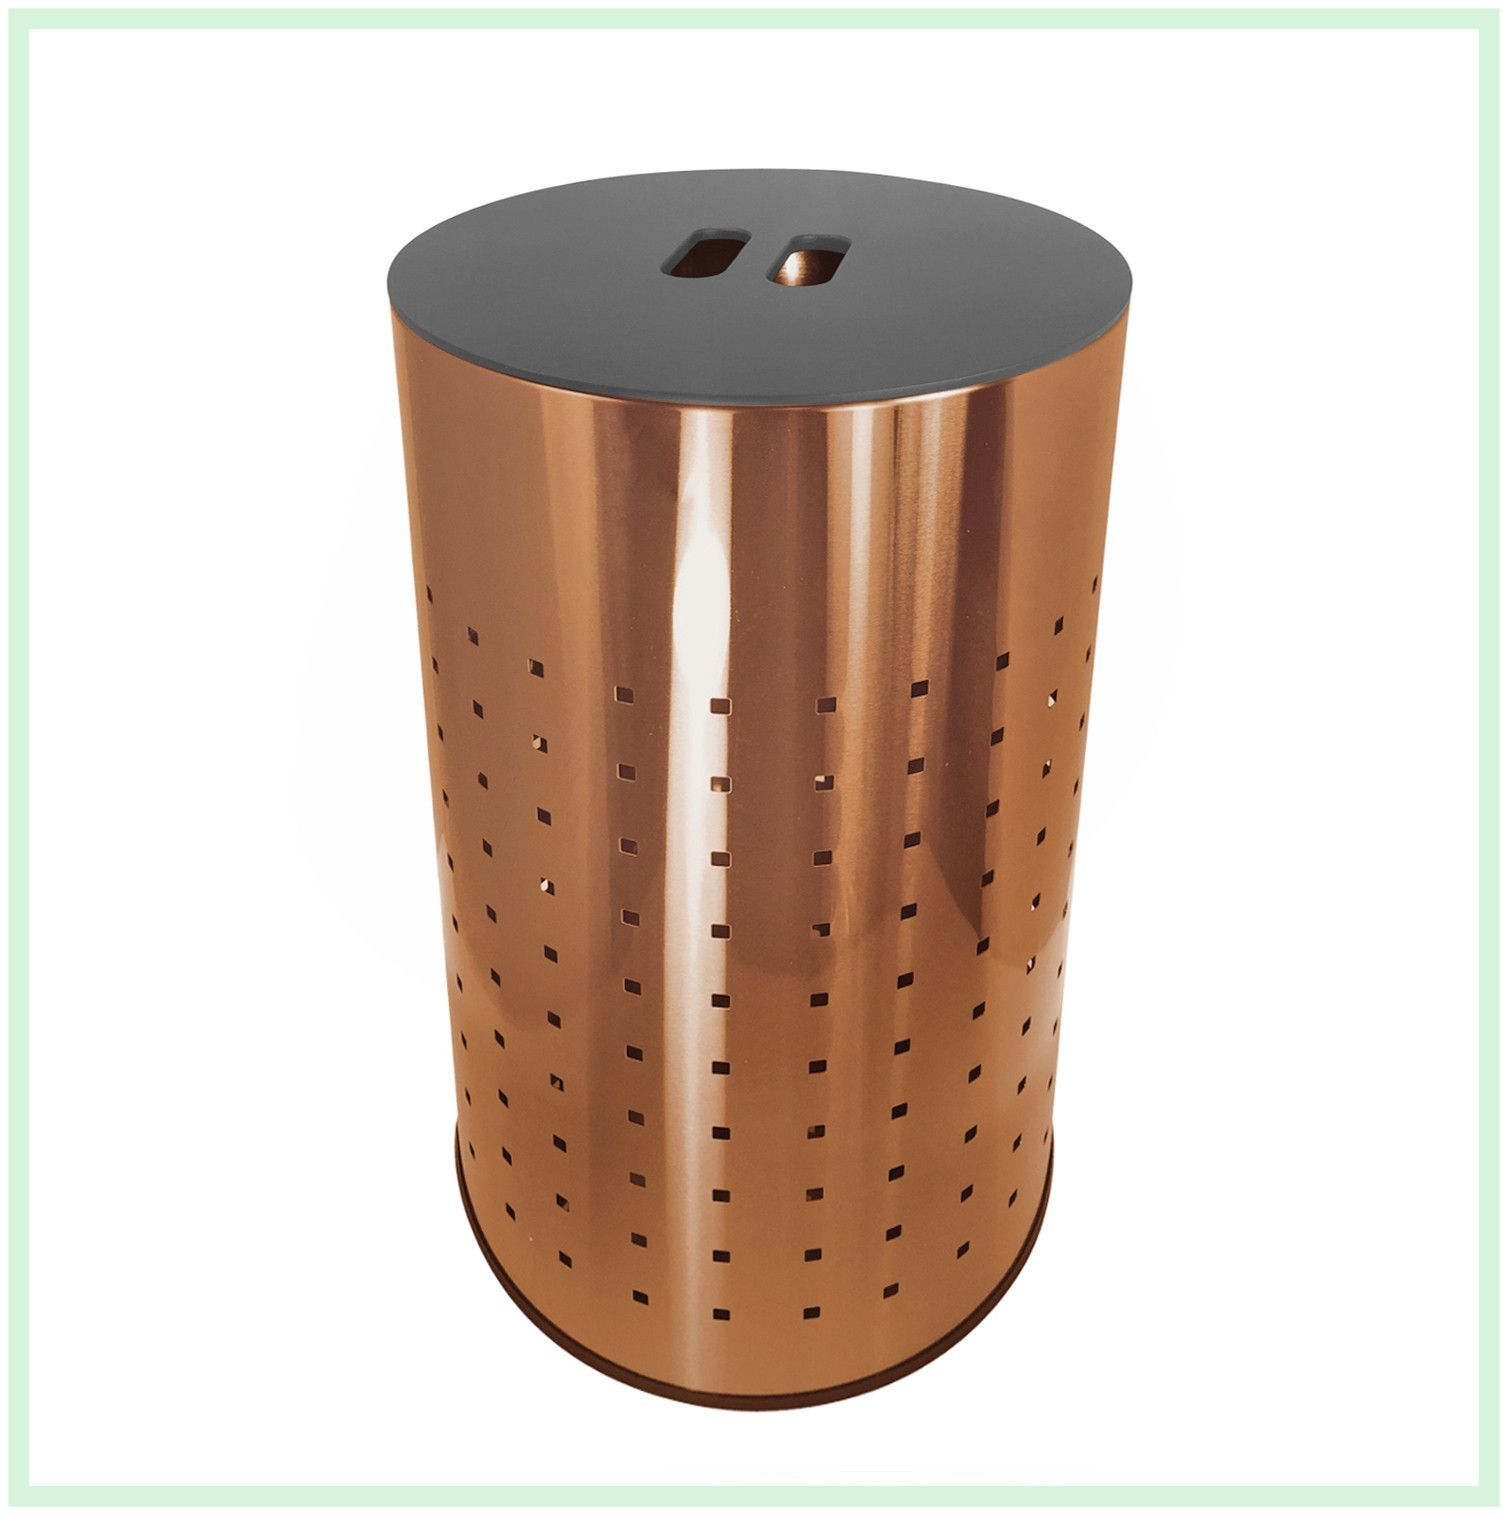 Brushed Copper Laundry Bin Hamper 50l Ventilated Stainless  # Muebles Ultramodernos